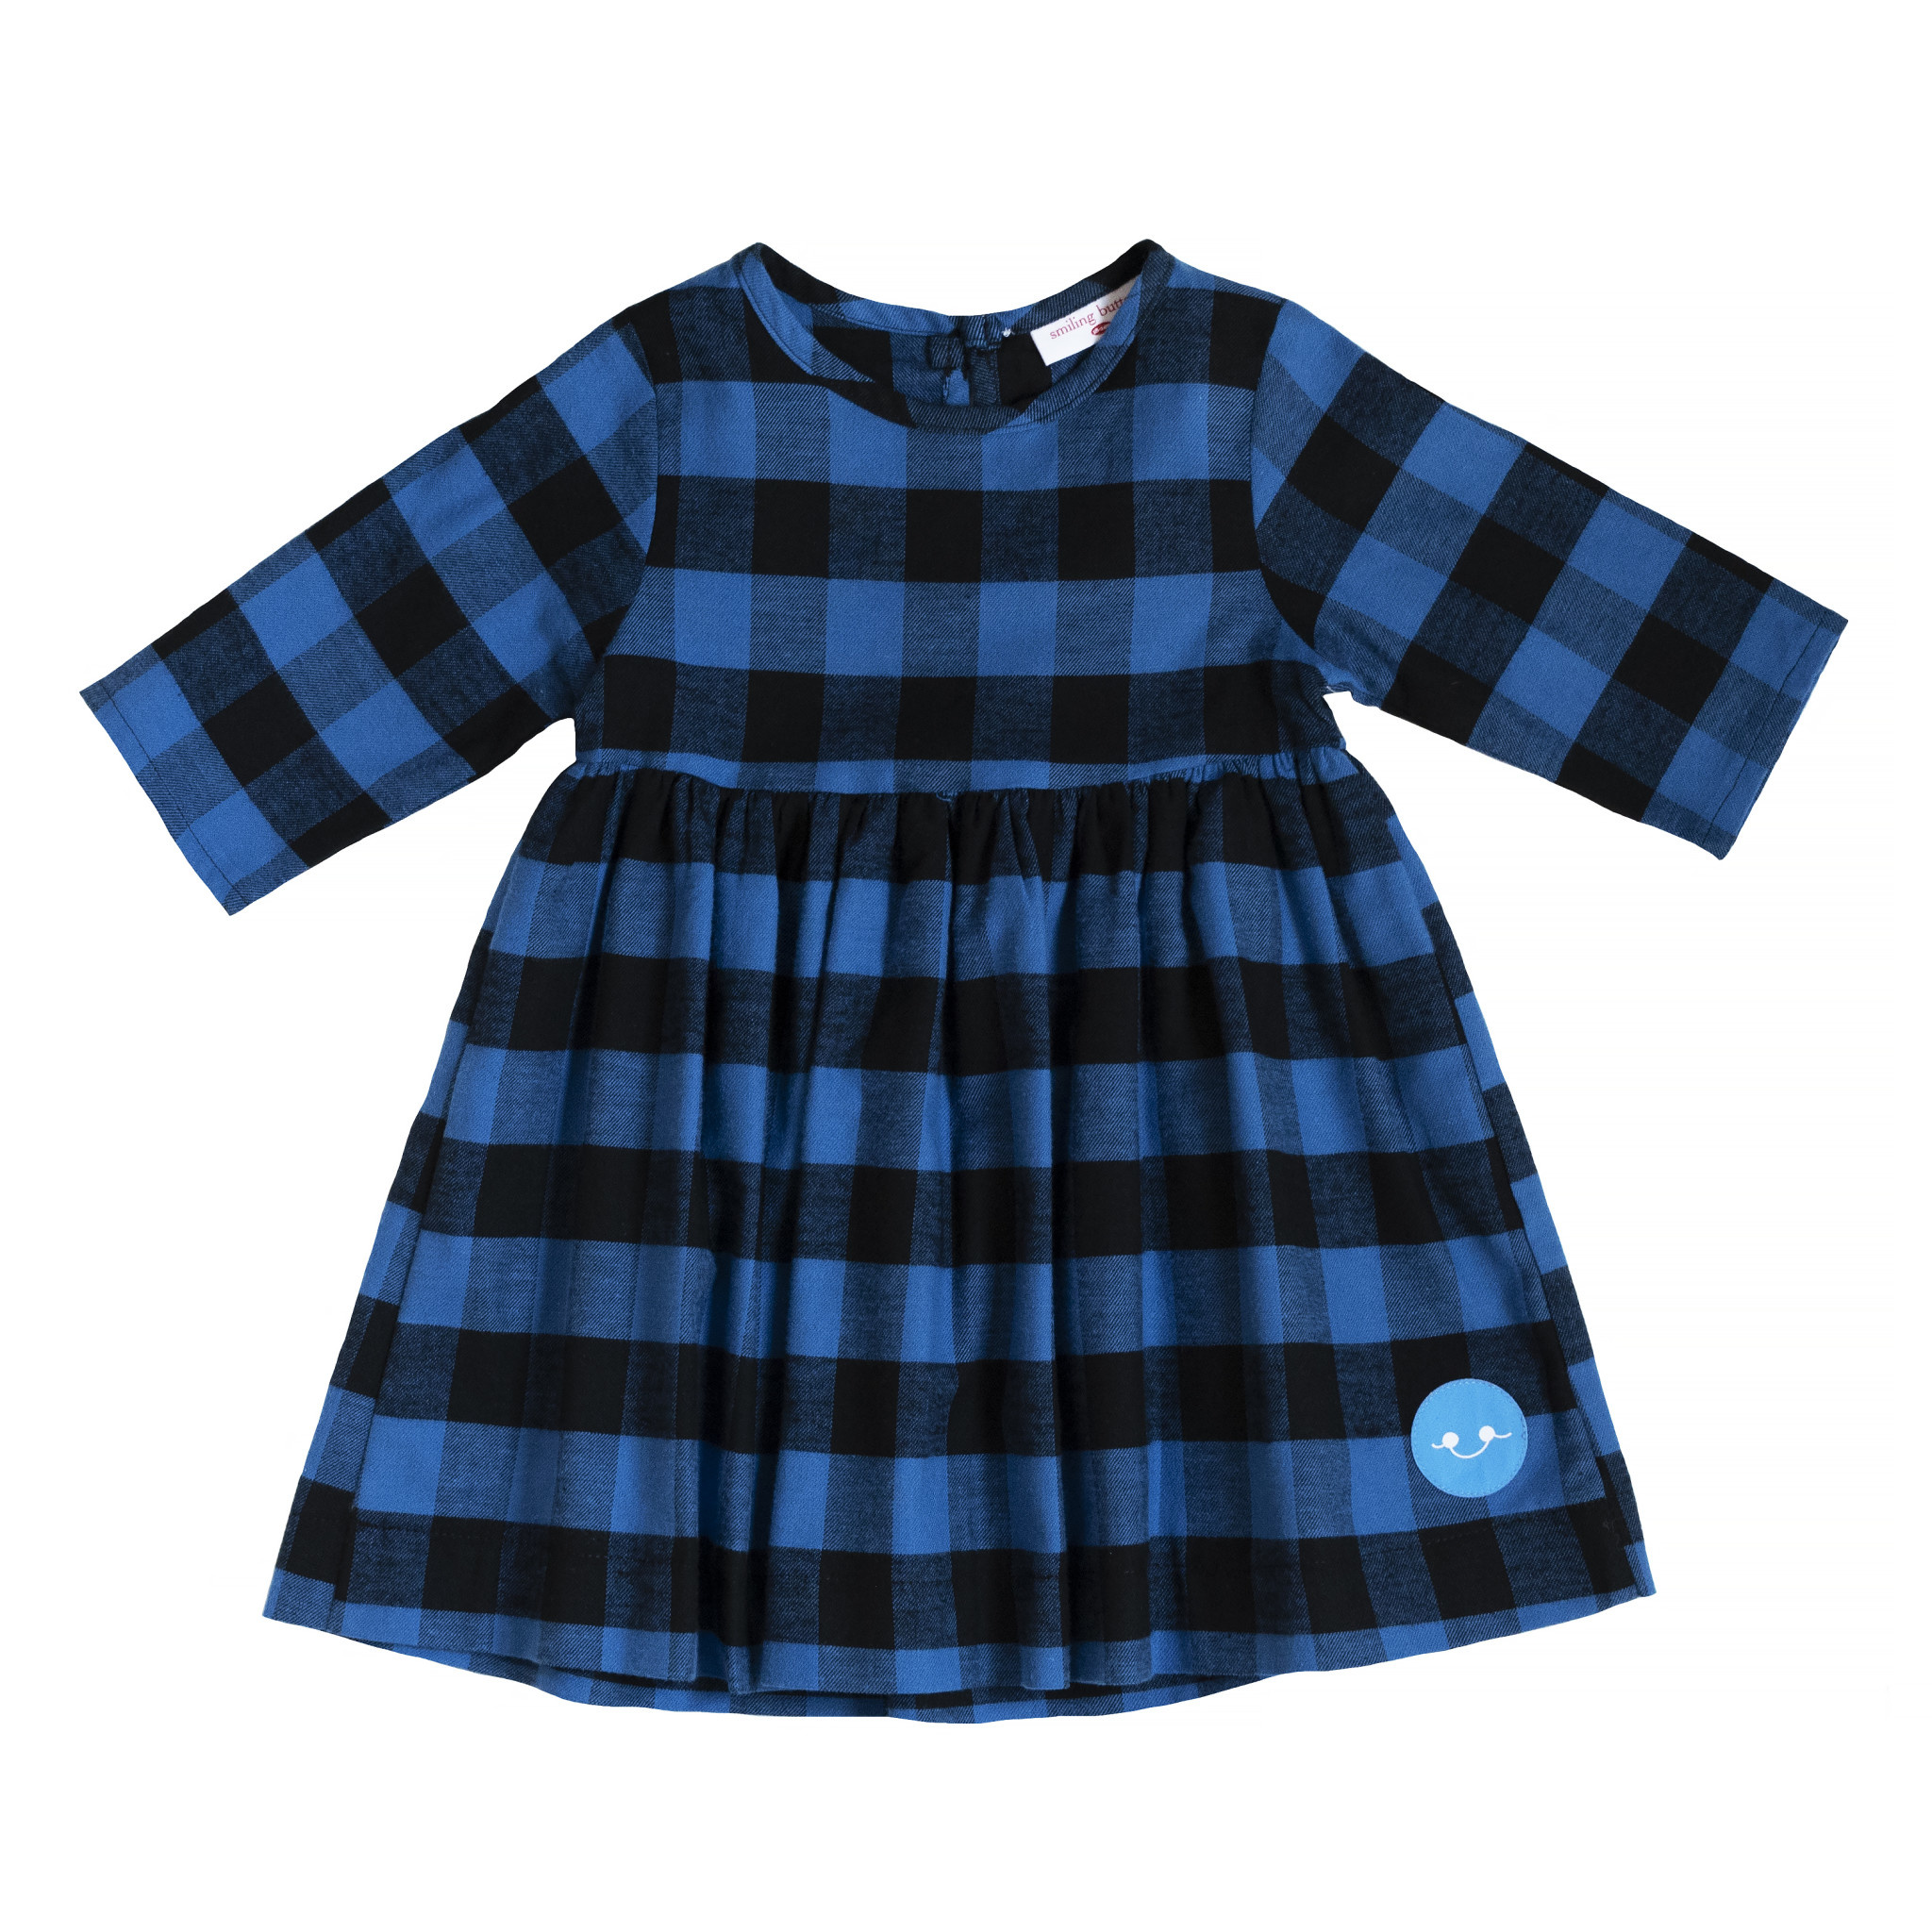 Smiling Button Smiling Button Winnie Dress - Blue/Black Flannel Buffalo Check